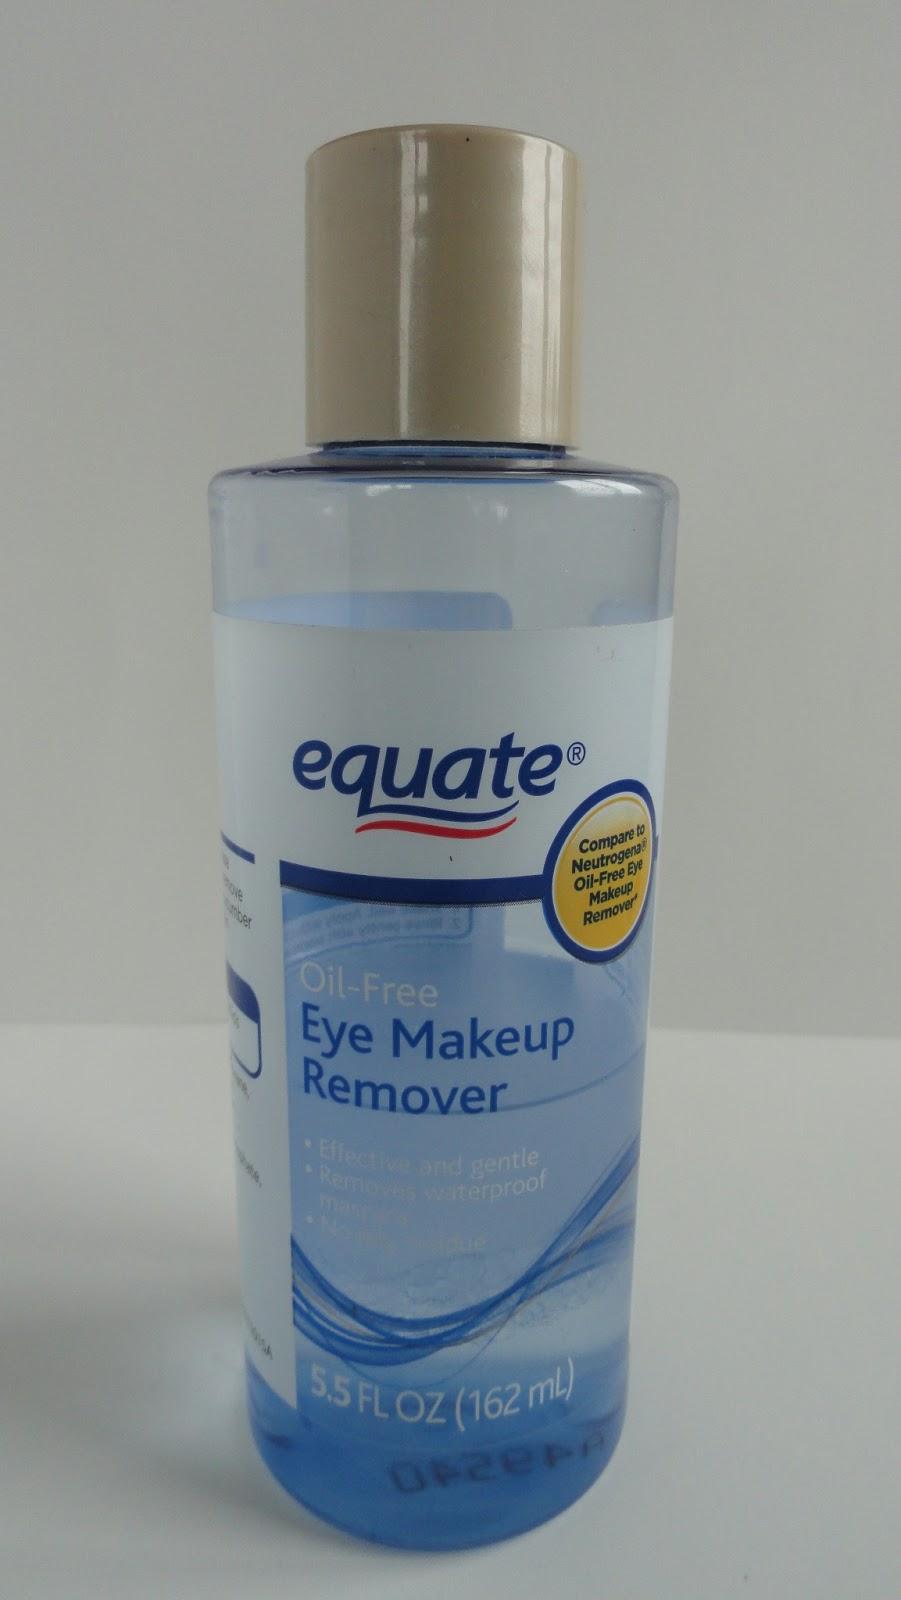 Equate Eye Makeup Remover